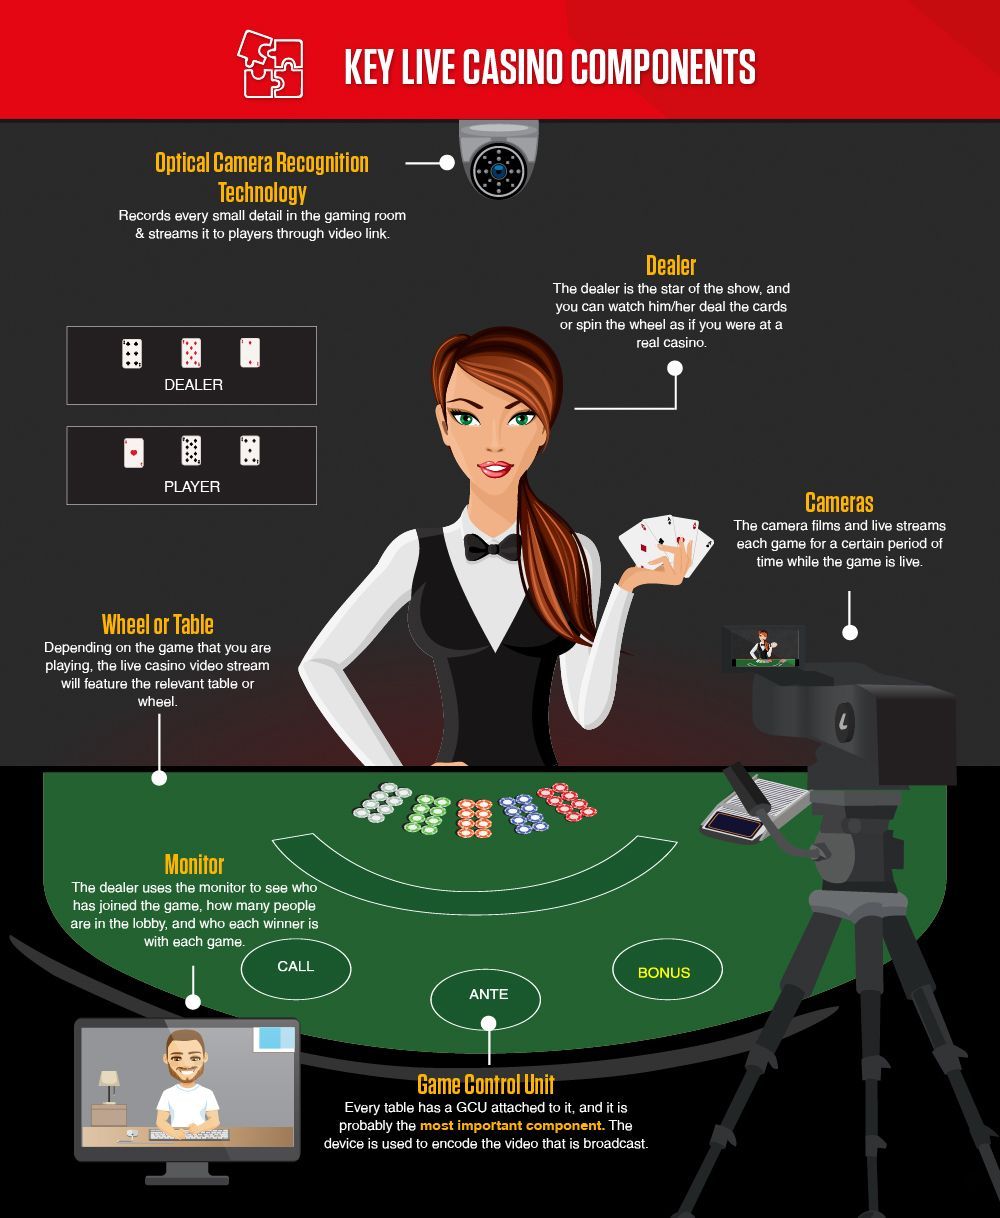 Casino component poker lobby new formula one gambling